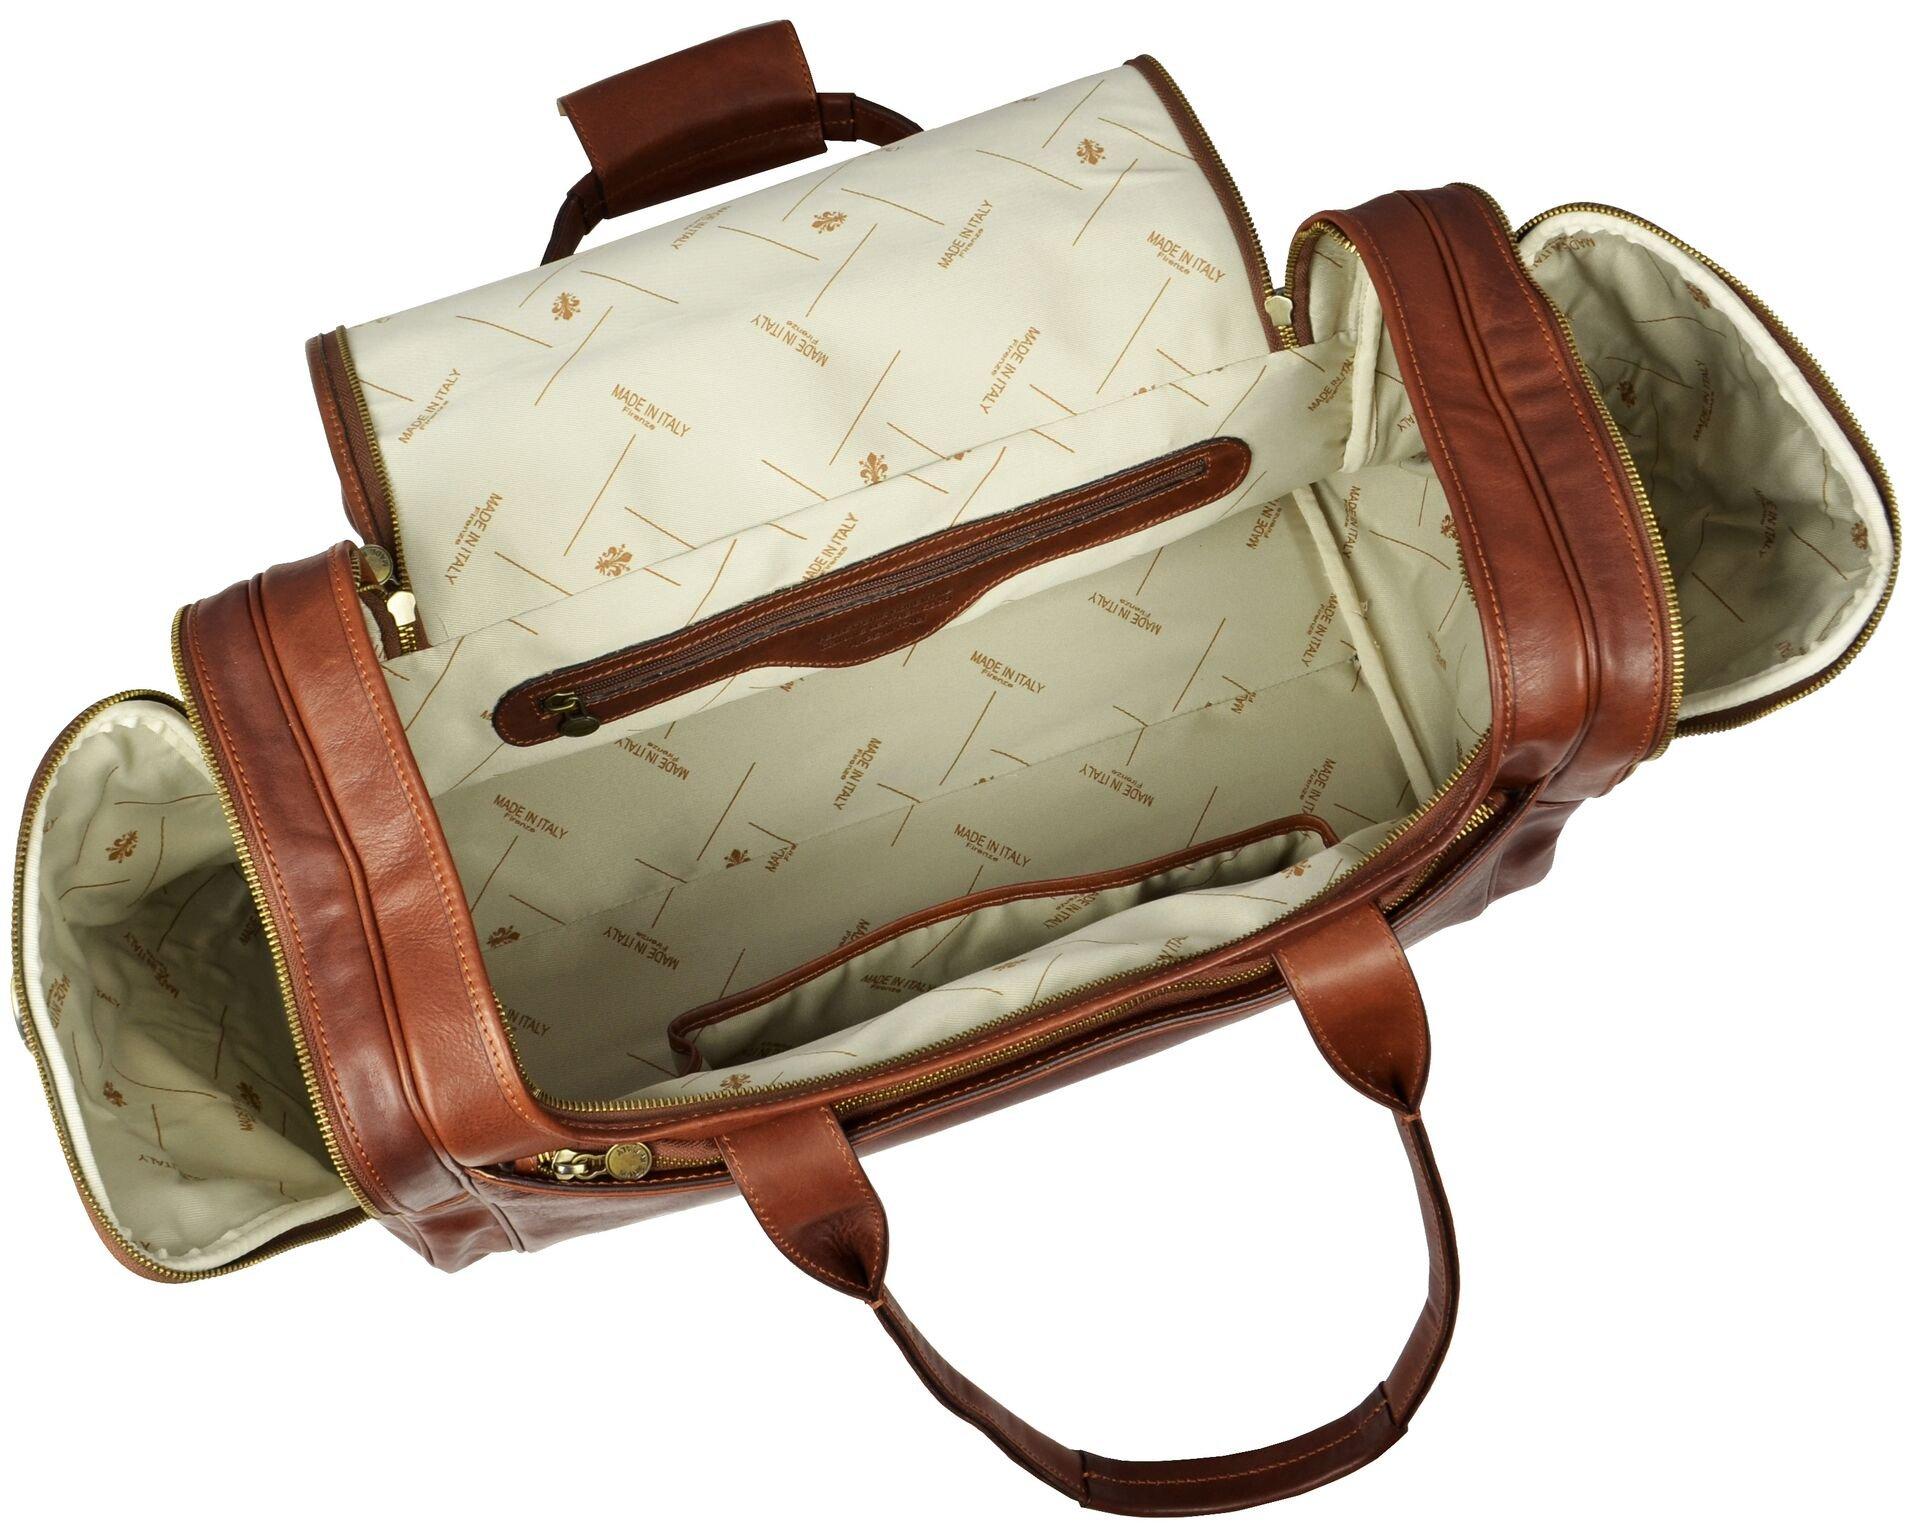 Leather Duffel Bag, Weekend Bag, Gym, Large Travel Bag, Cognac, Brown - Time Resistance by Time Resistance (Image #6)